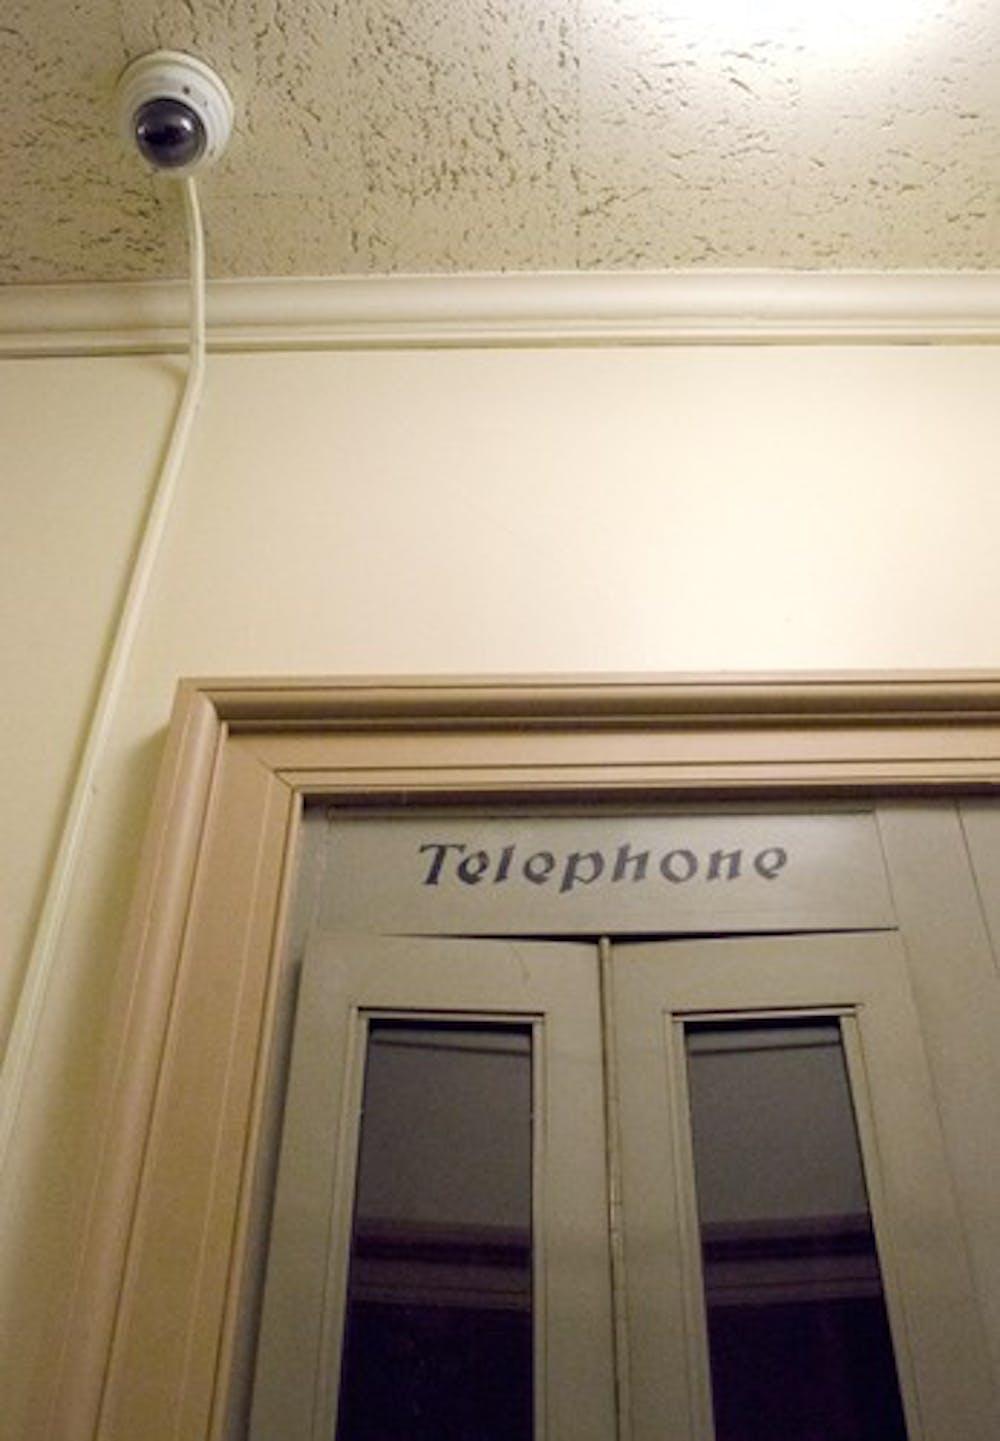 Security cameras installed in Voigt Hall